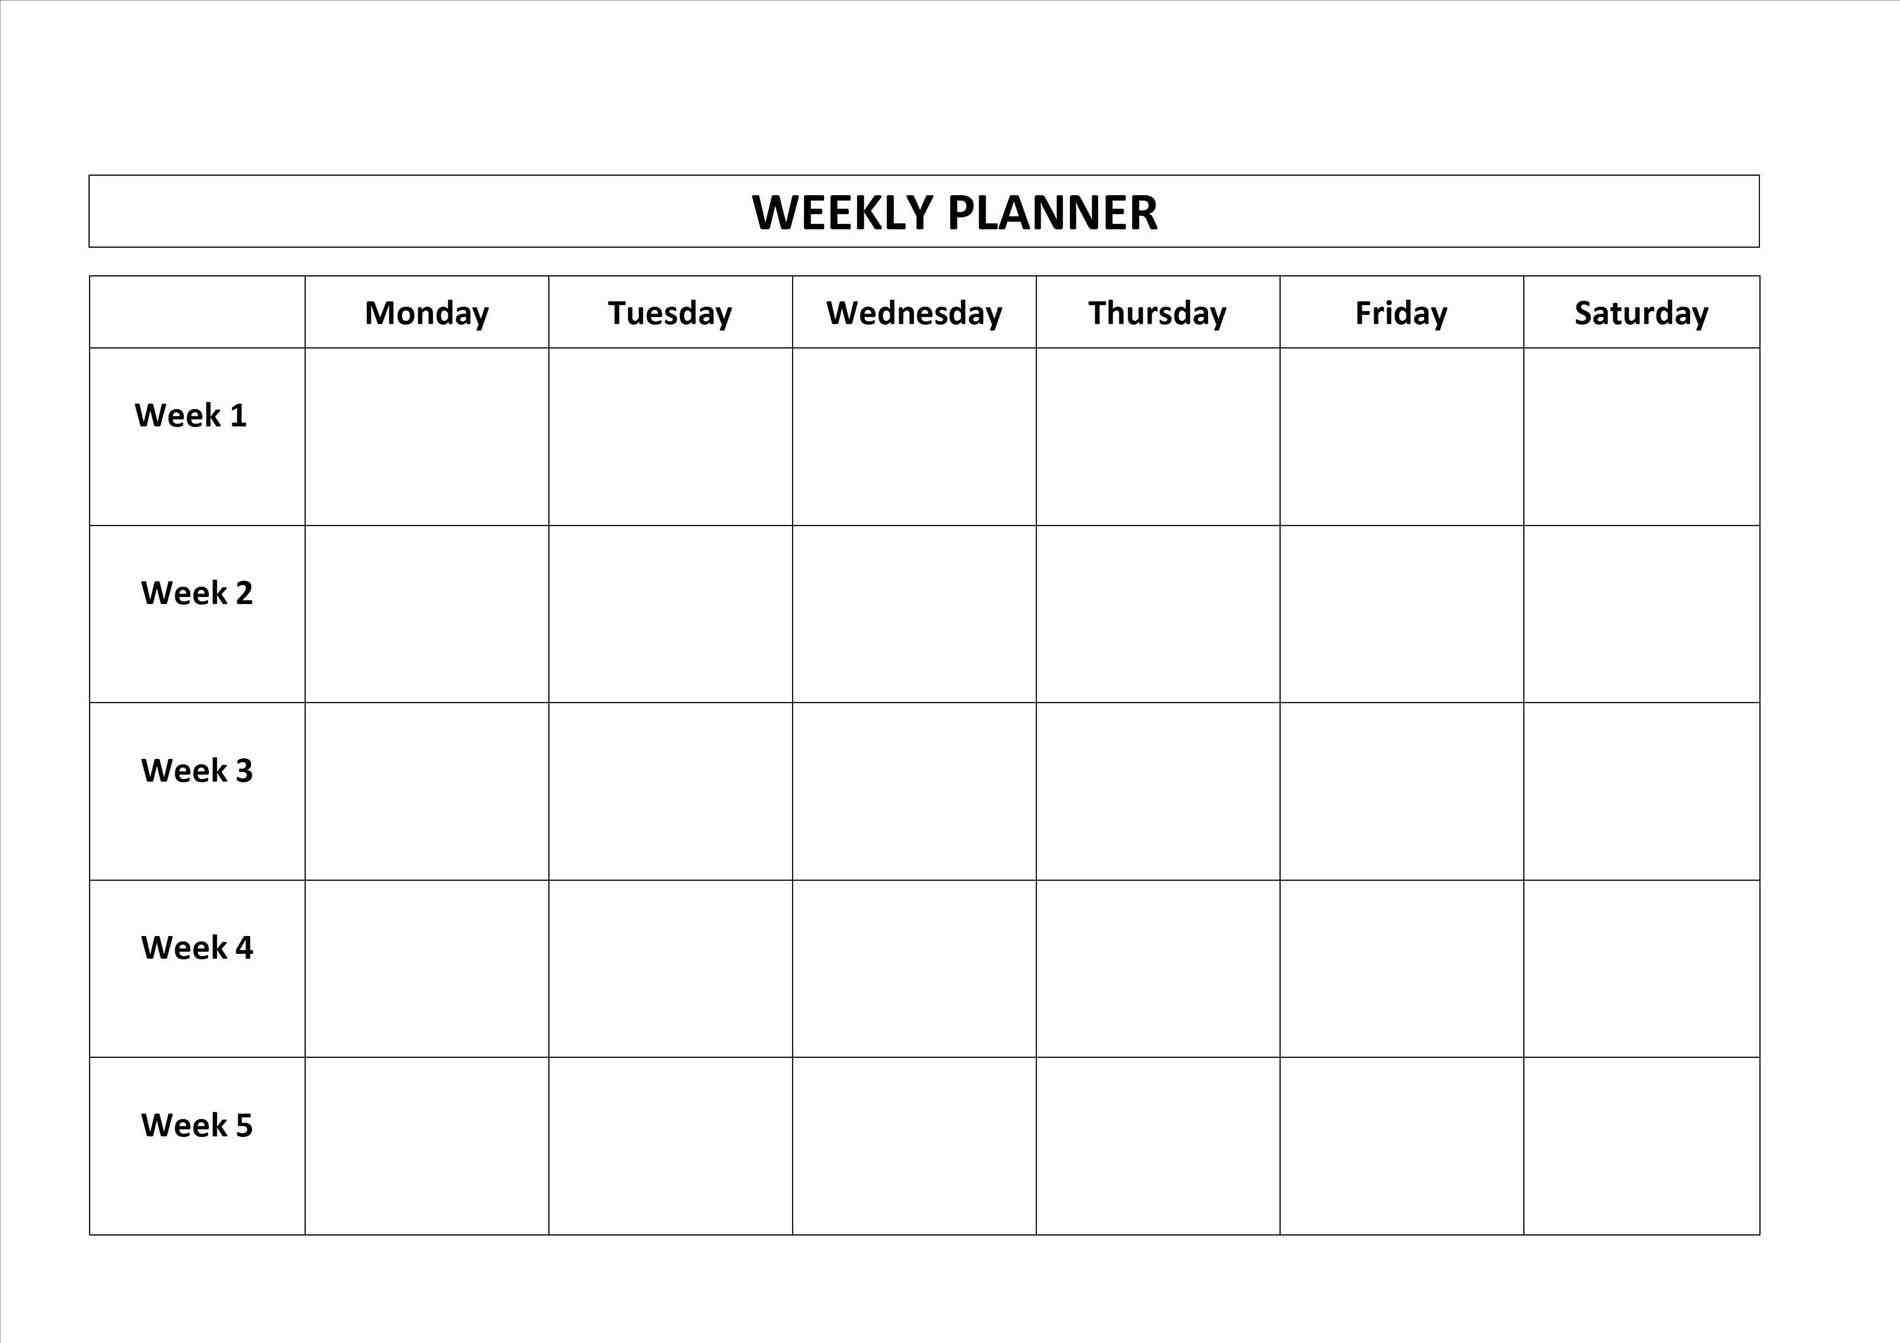 Monday Thru Friday Calendar Printable | Template Calendar Printable for Printable Weekly Schedule Monday Thru Friday